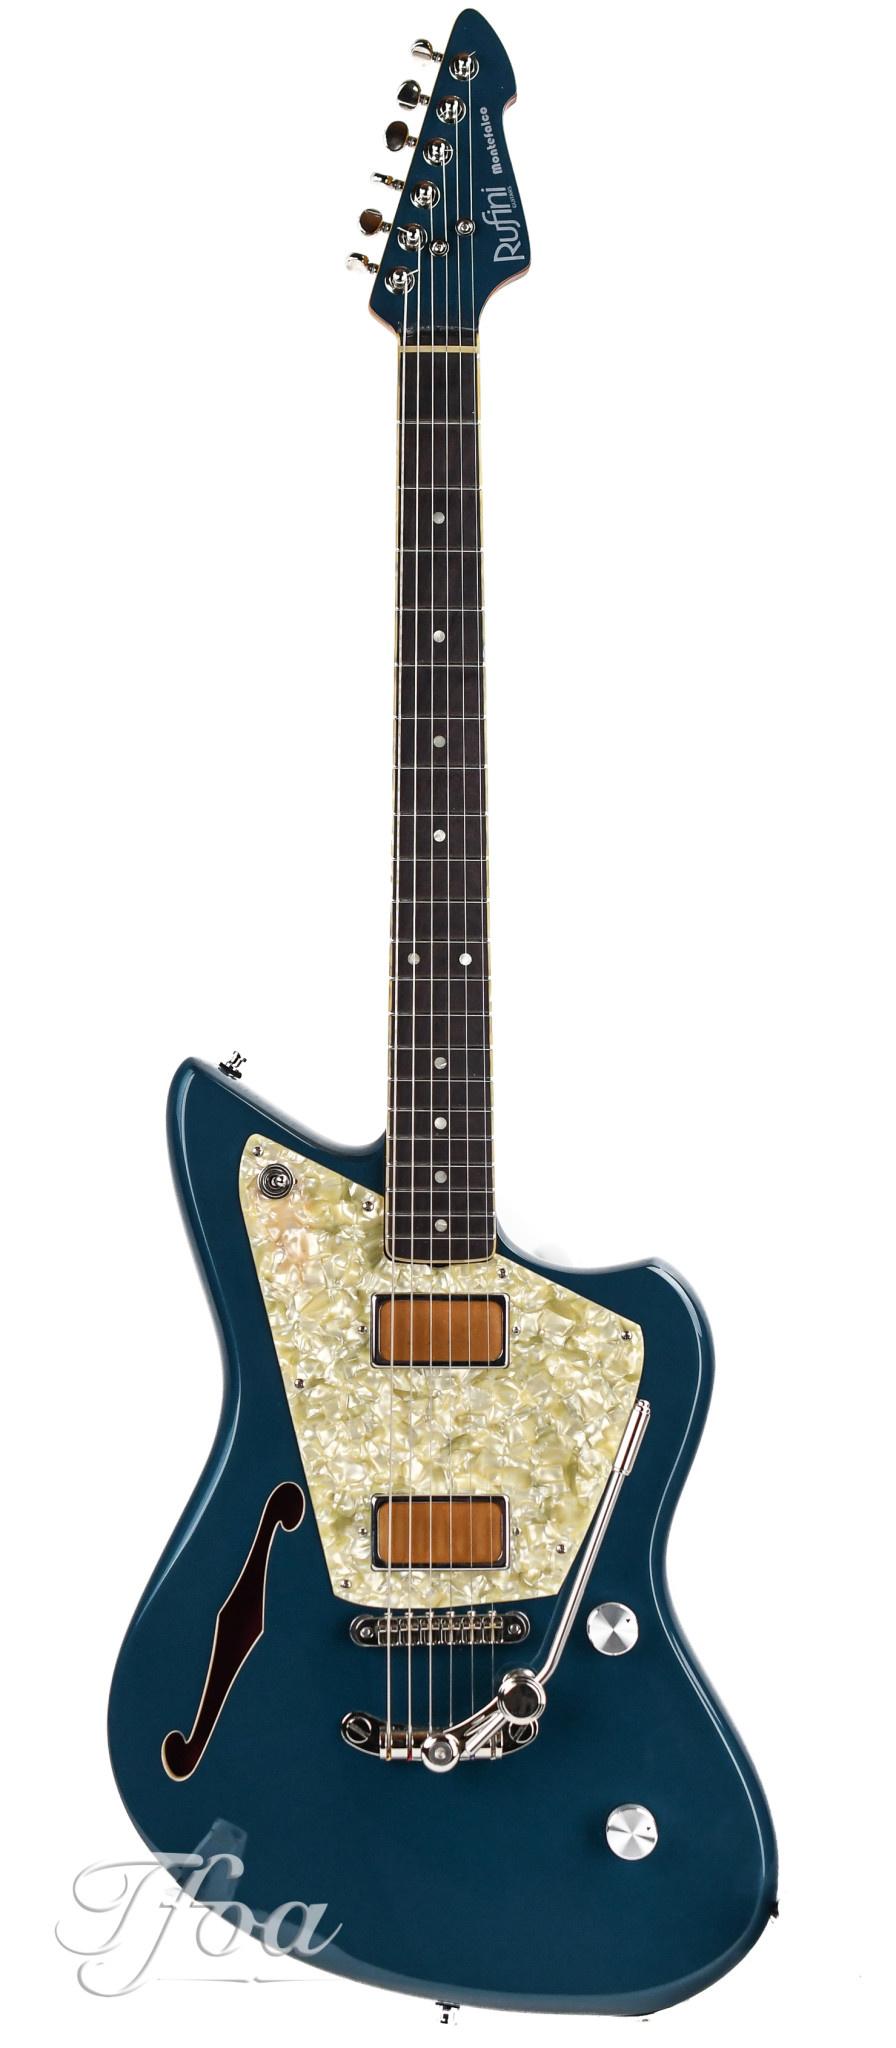 Rufini Guitars Montefalco Semi Hollow Magpie Metallic